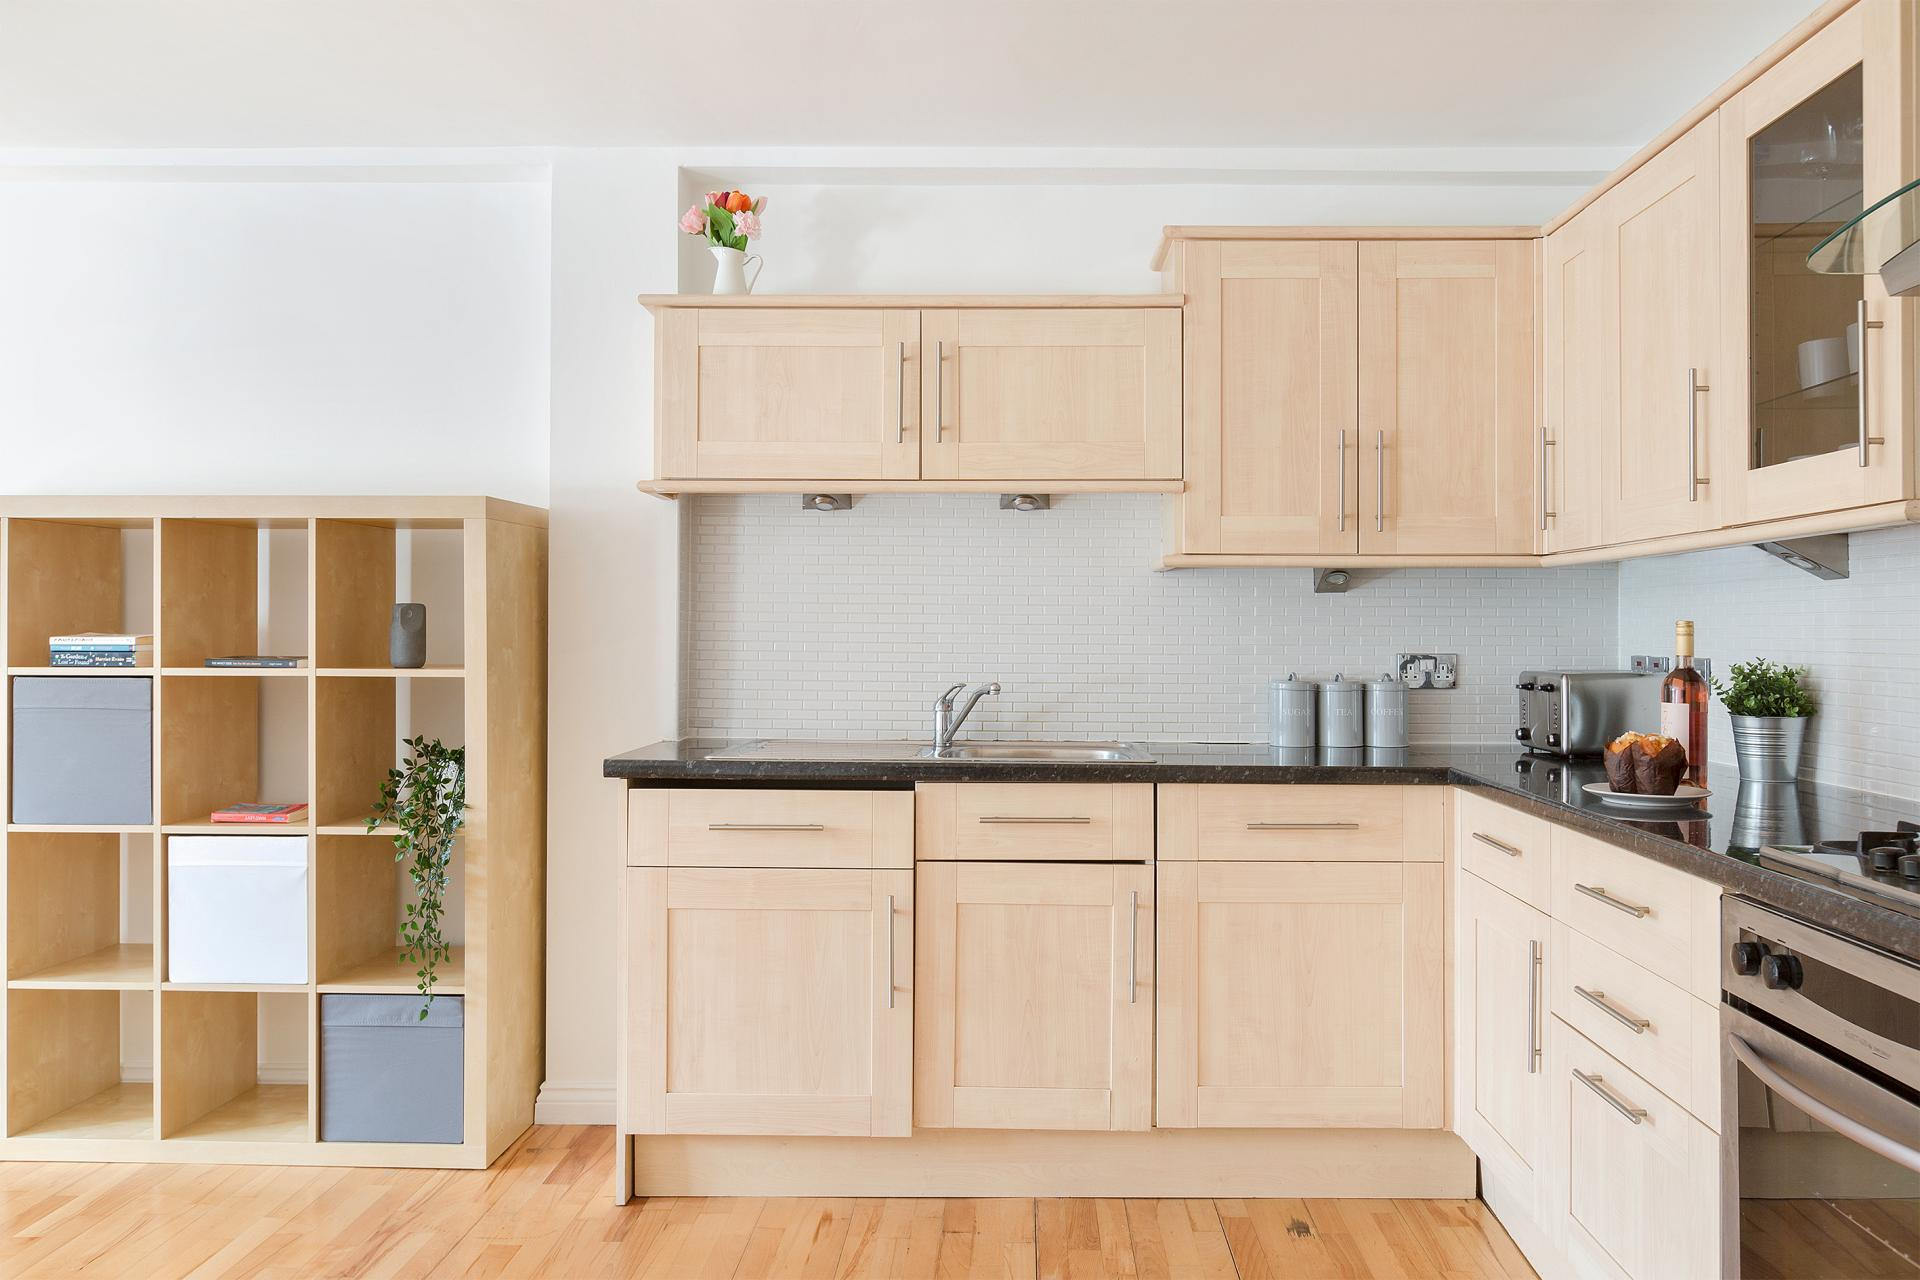 Kitchen at Serenity Apartment, Whitechapel, London - Citybase Apartments